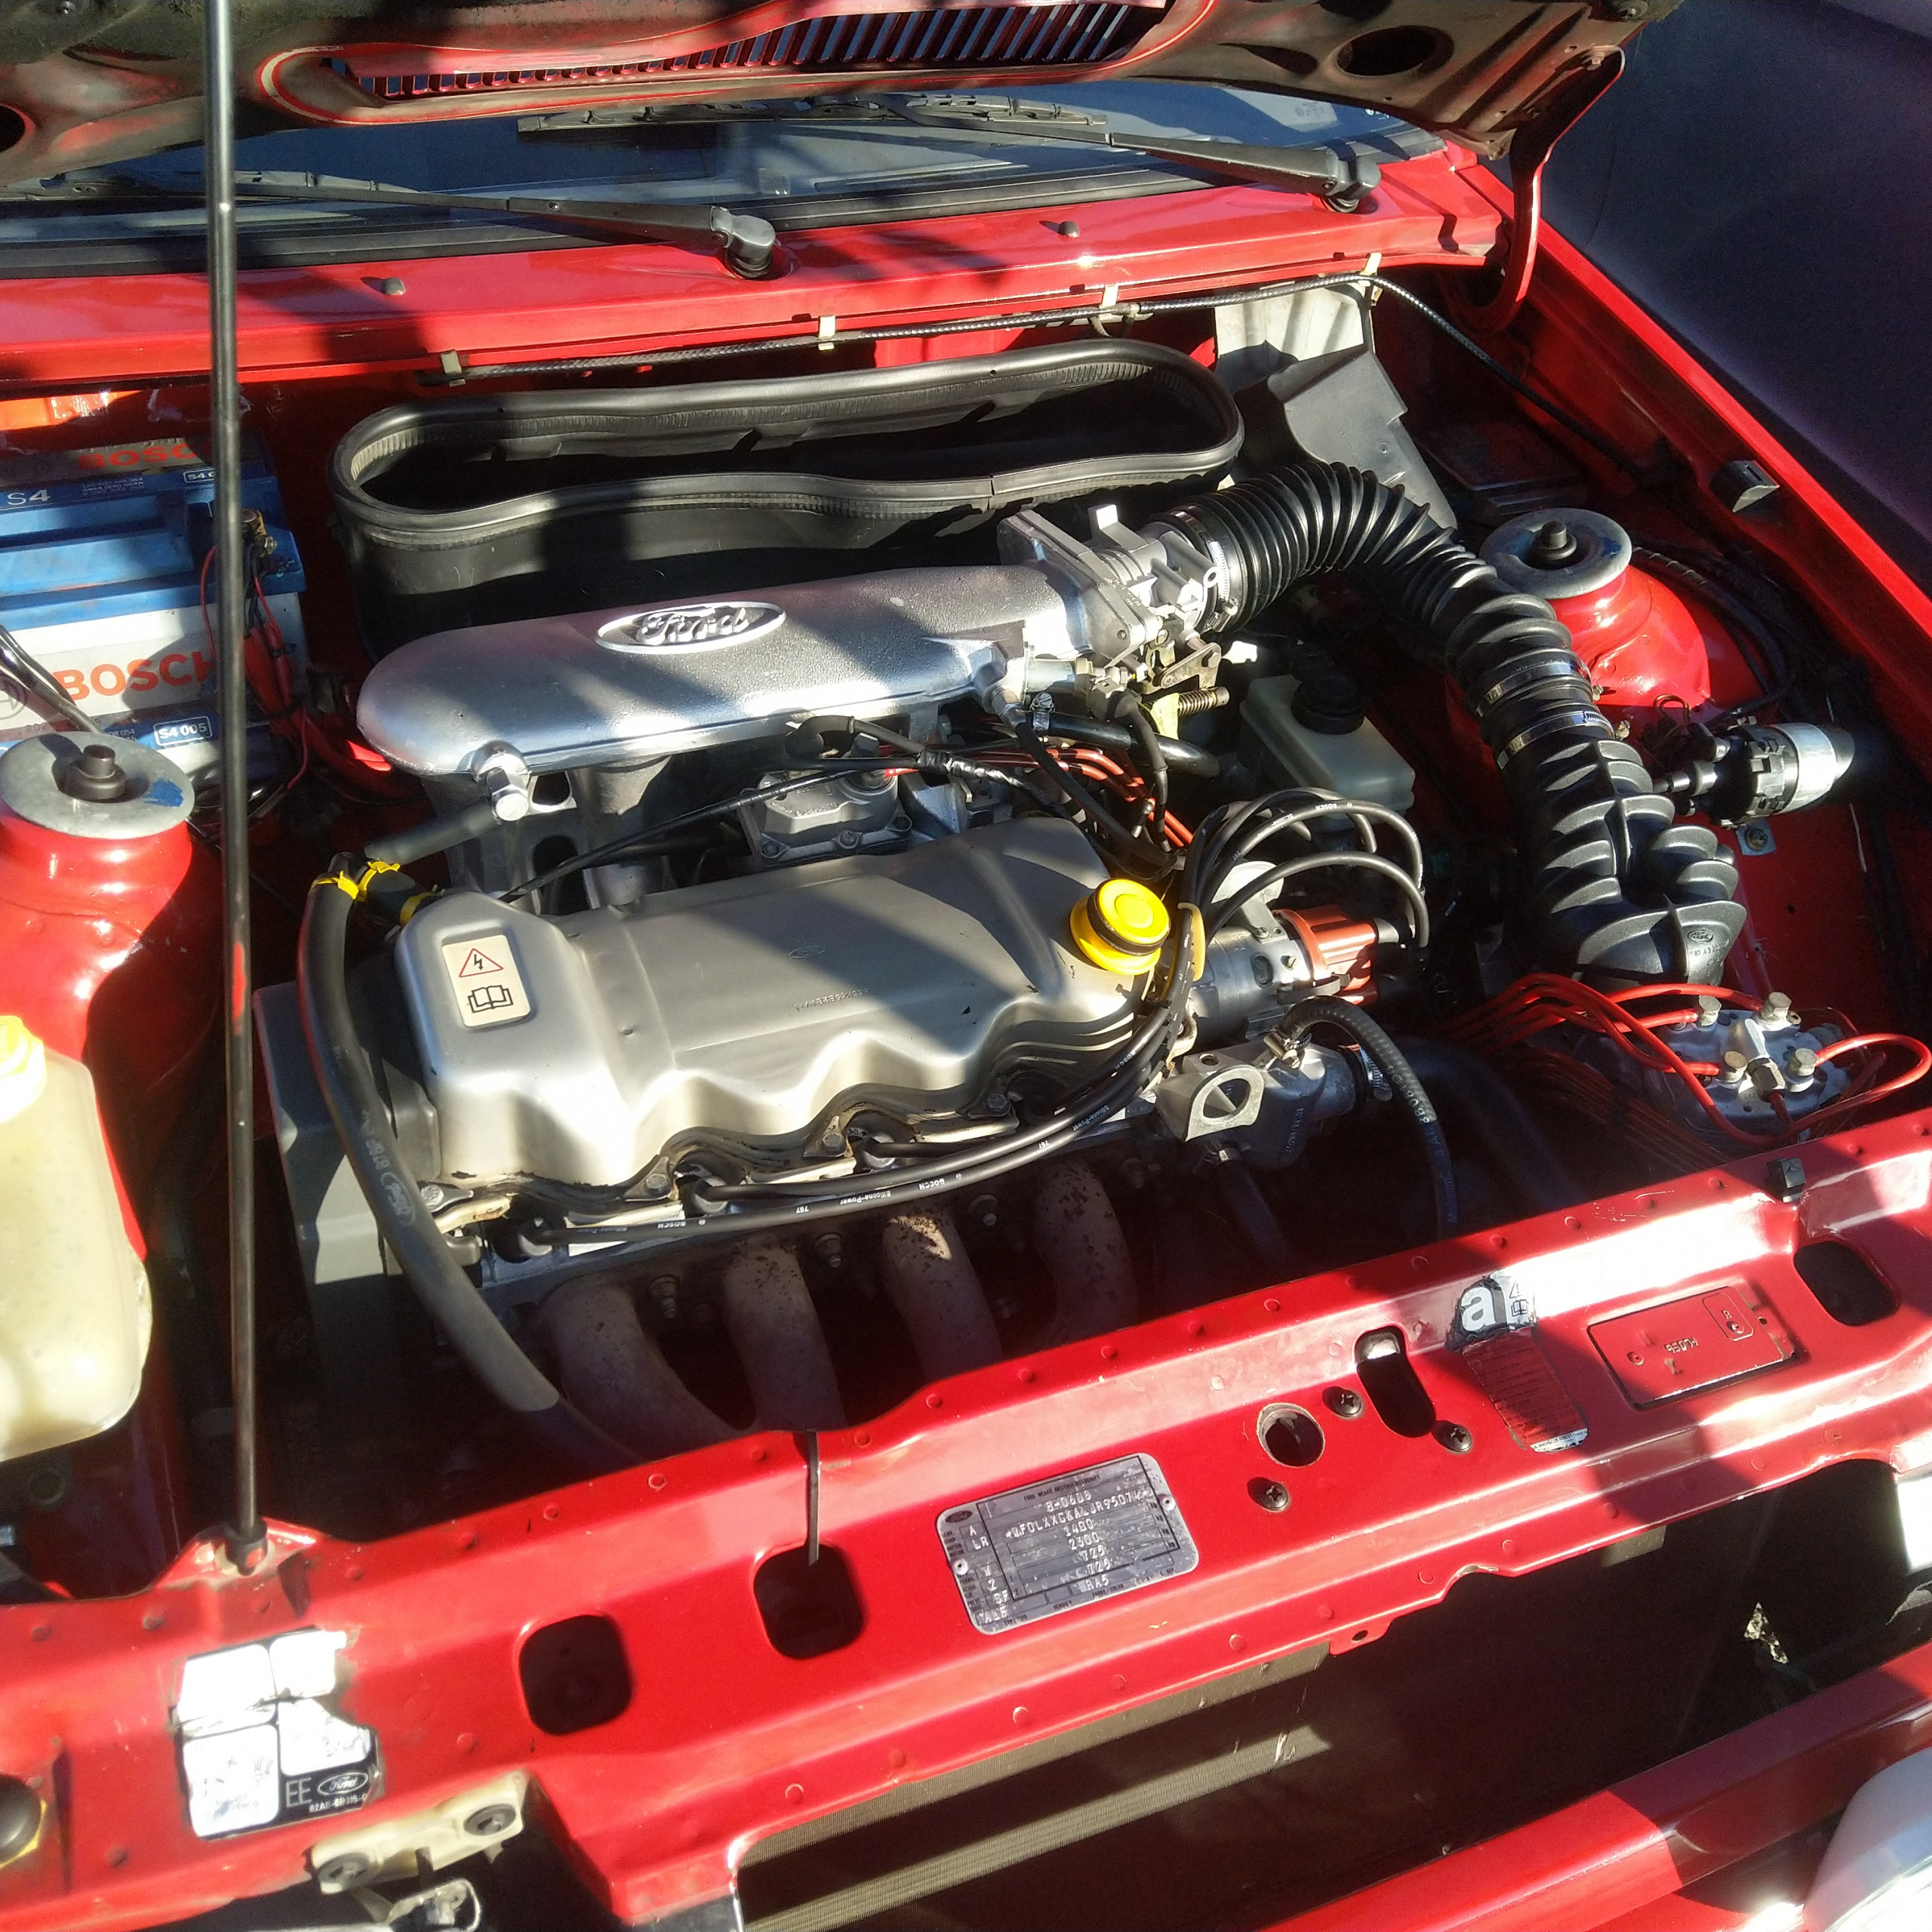 Ford Cvh Engine - Wikipedia